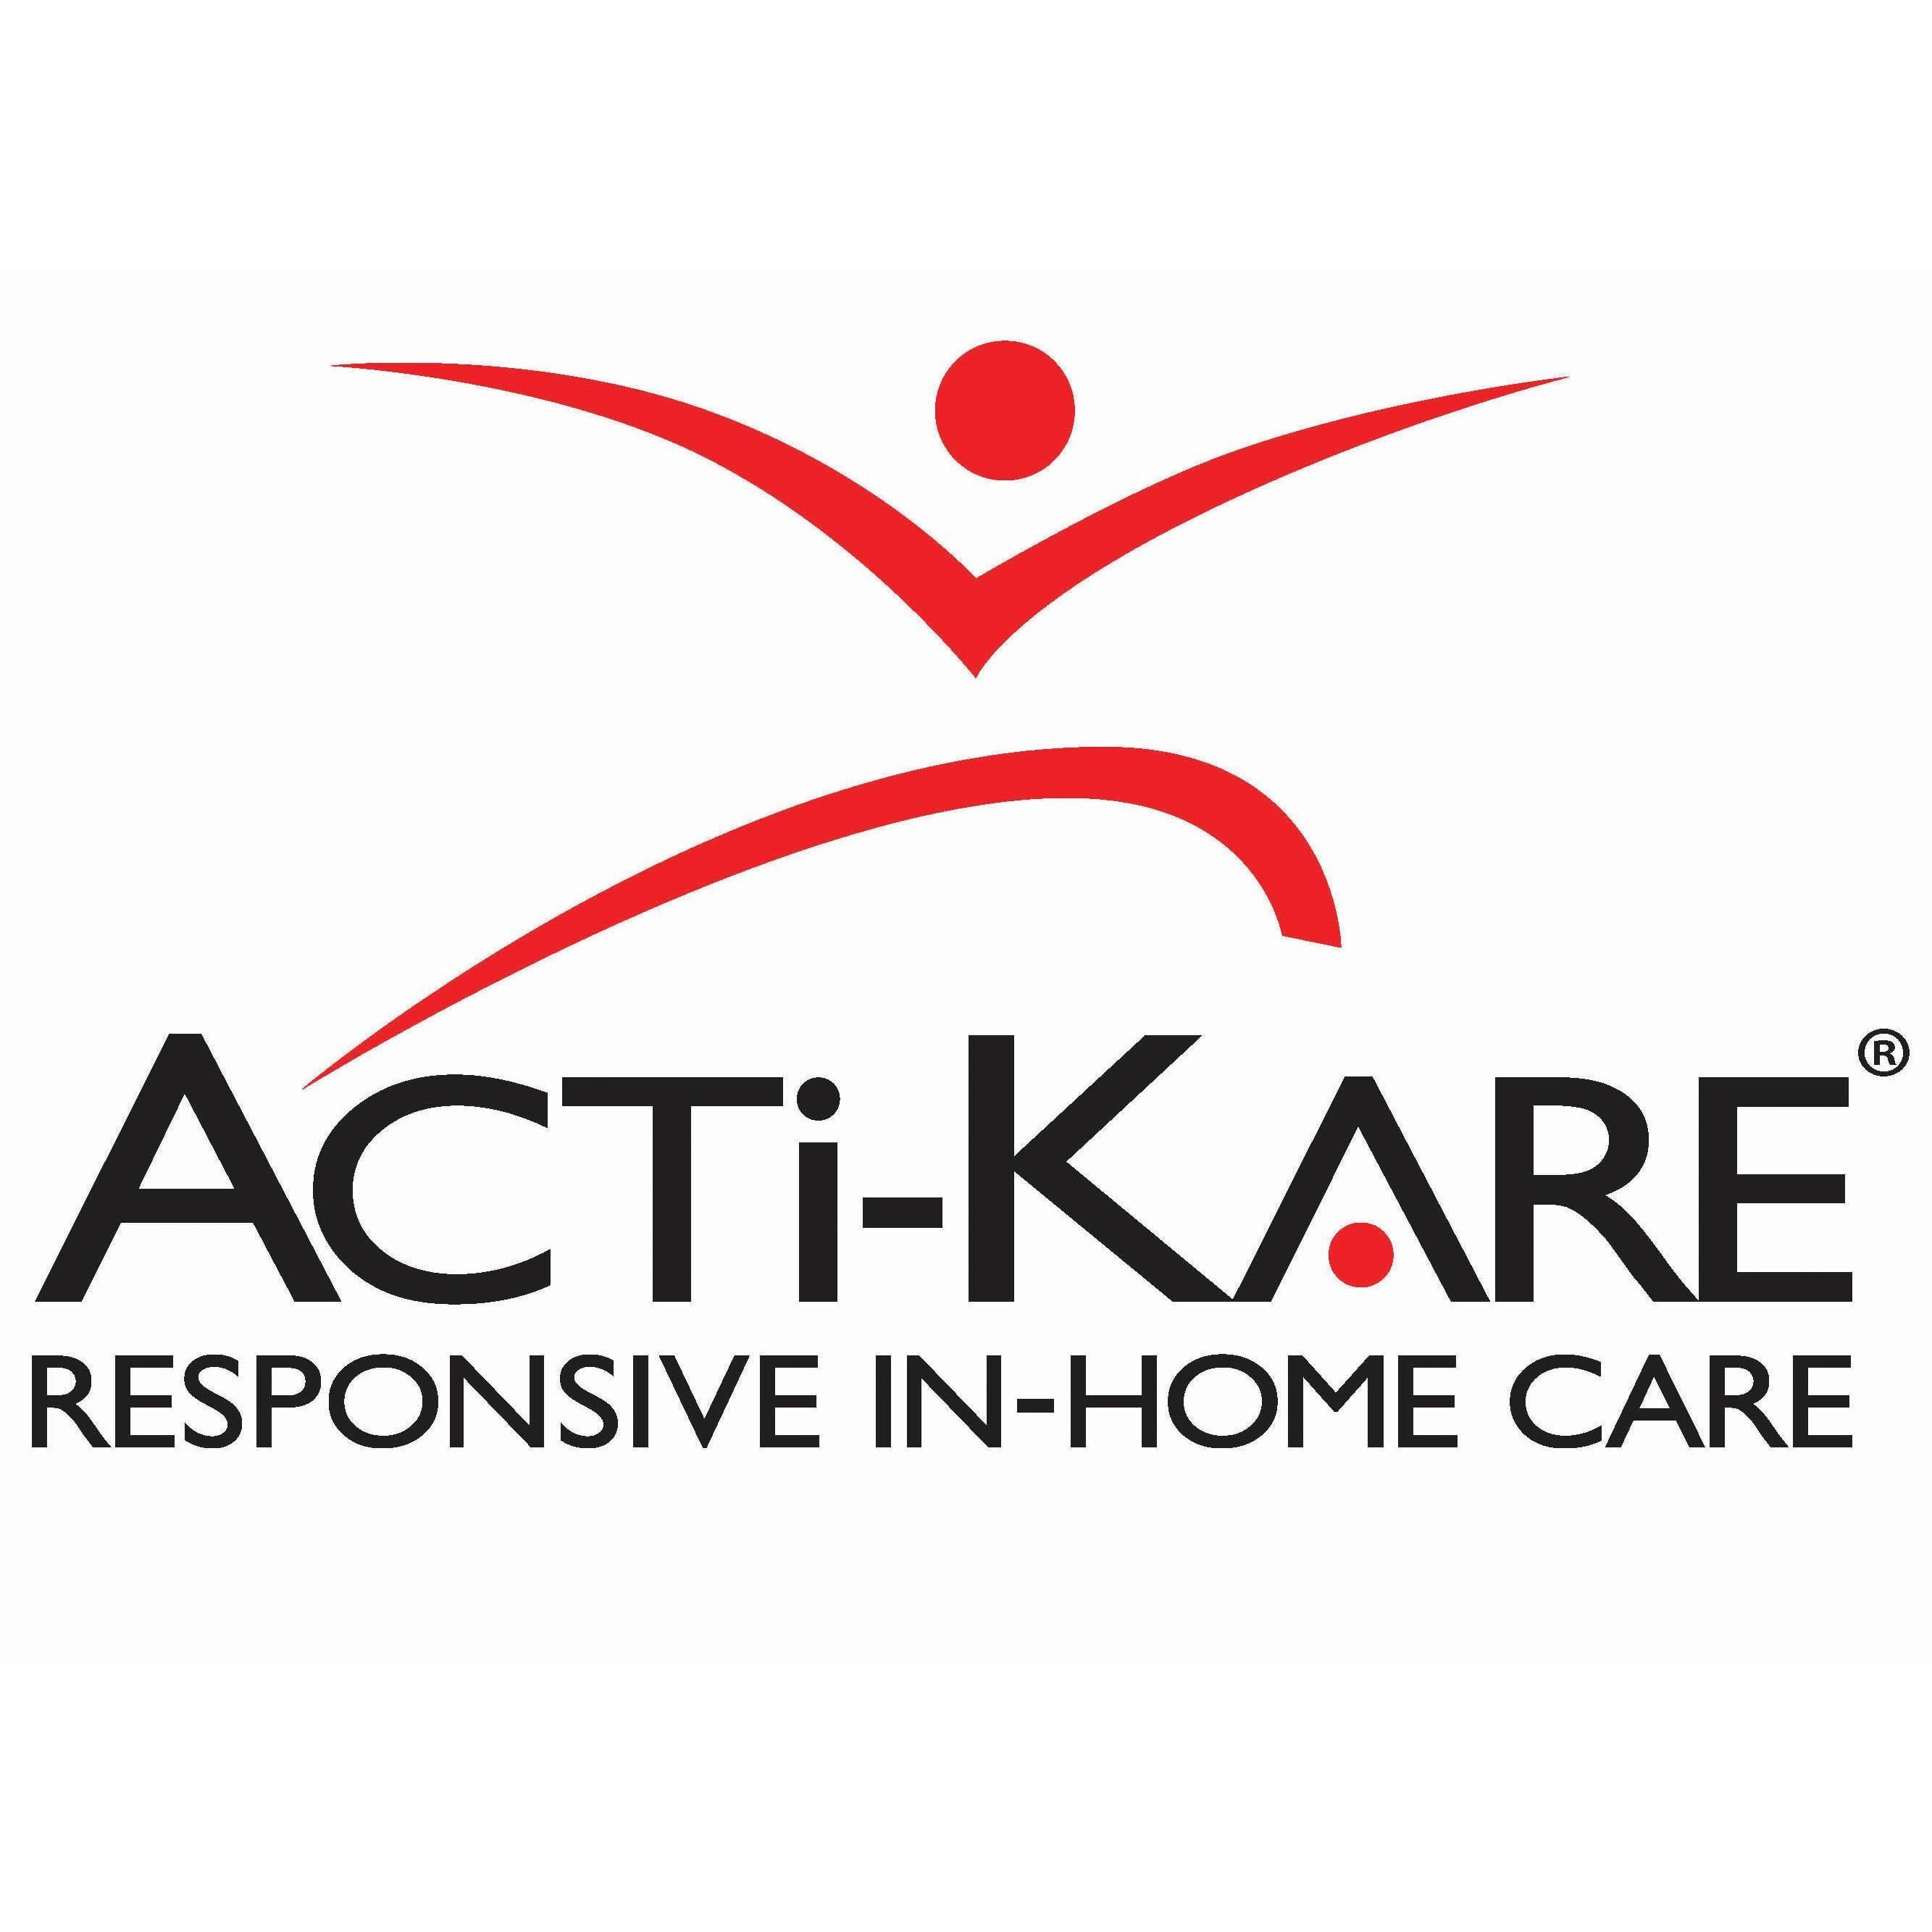 Acti-Kare Responsive In-Home Care of Jacksonville, FL